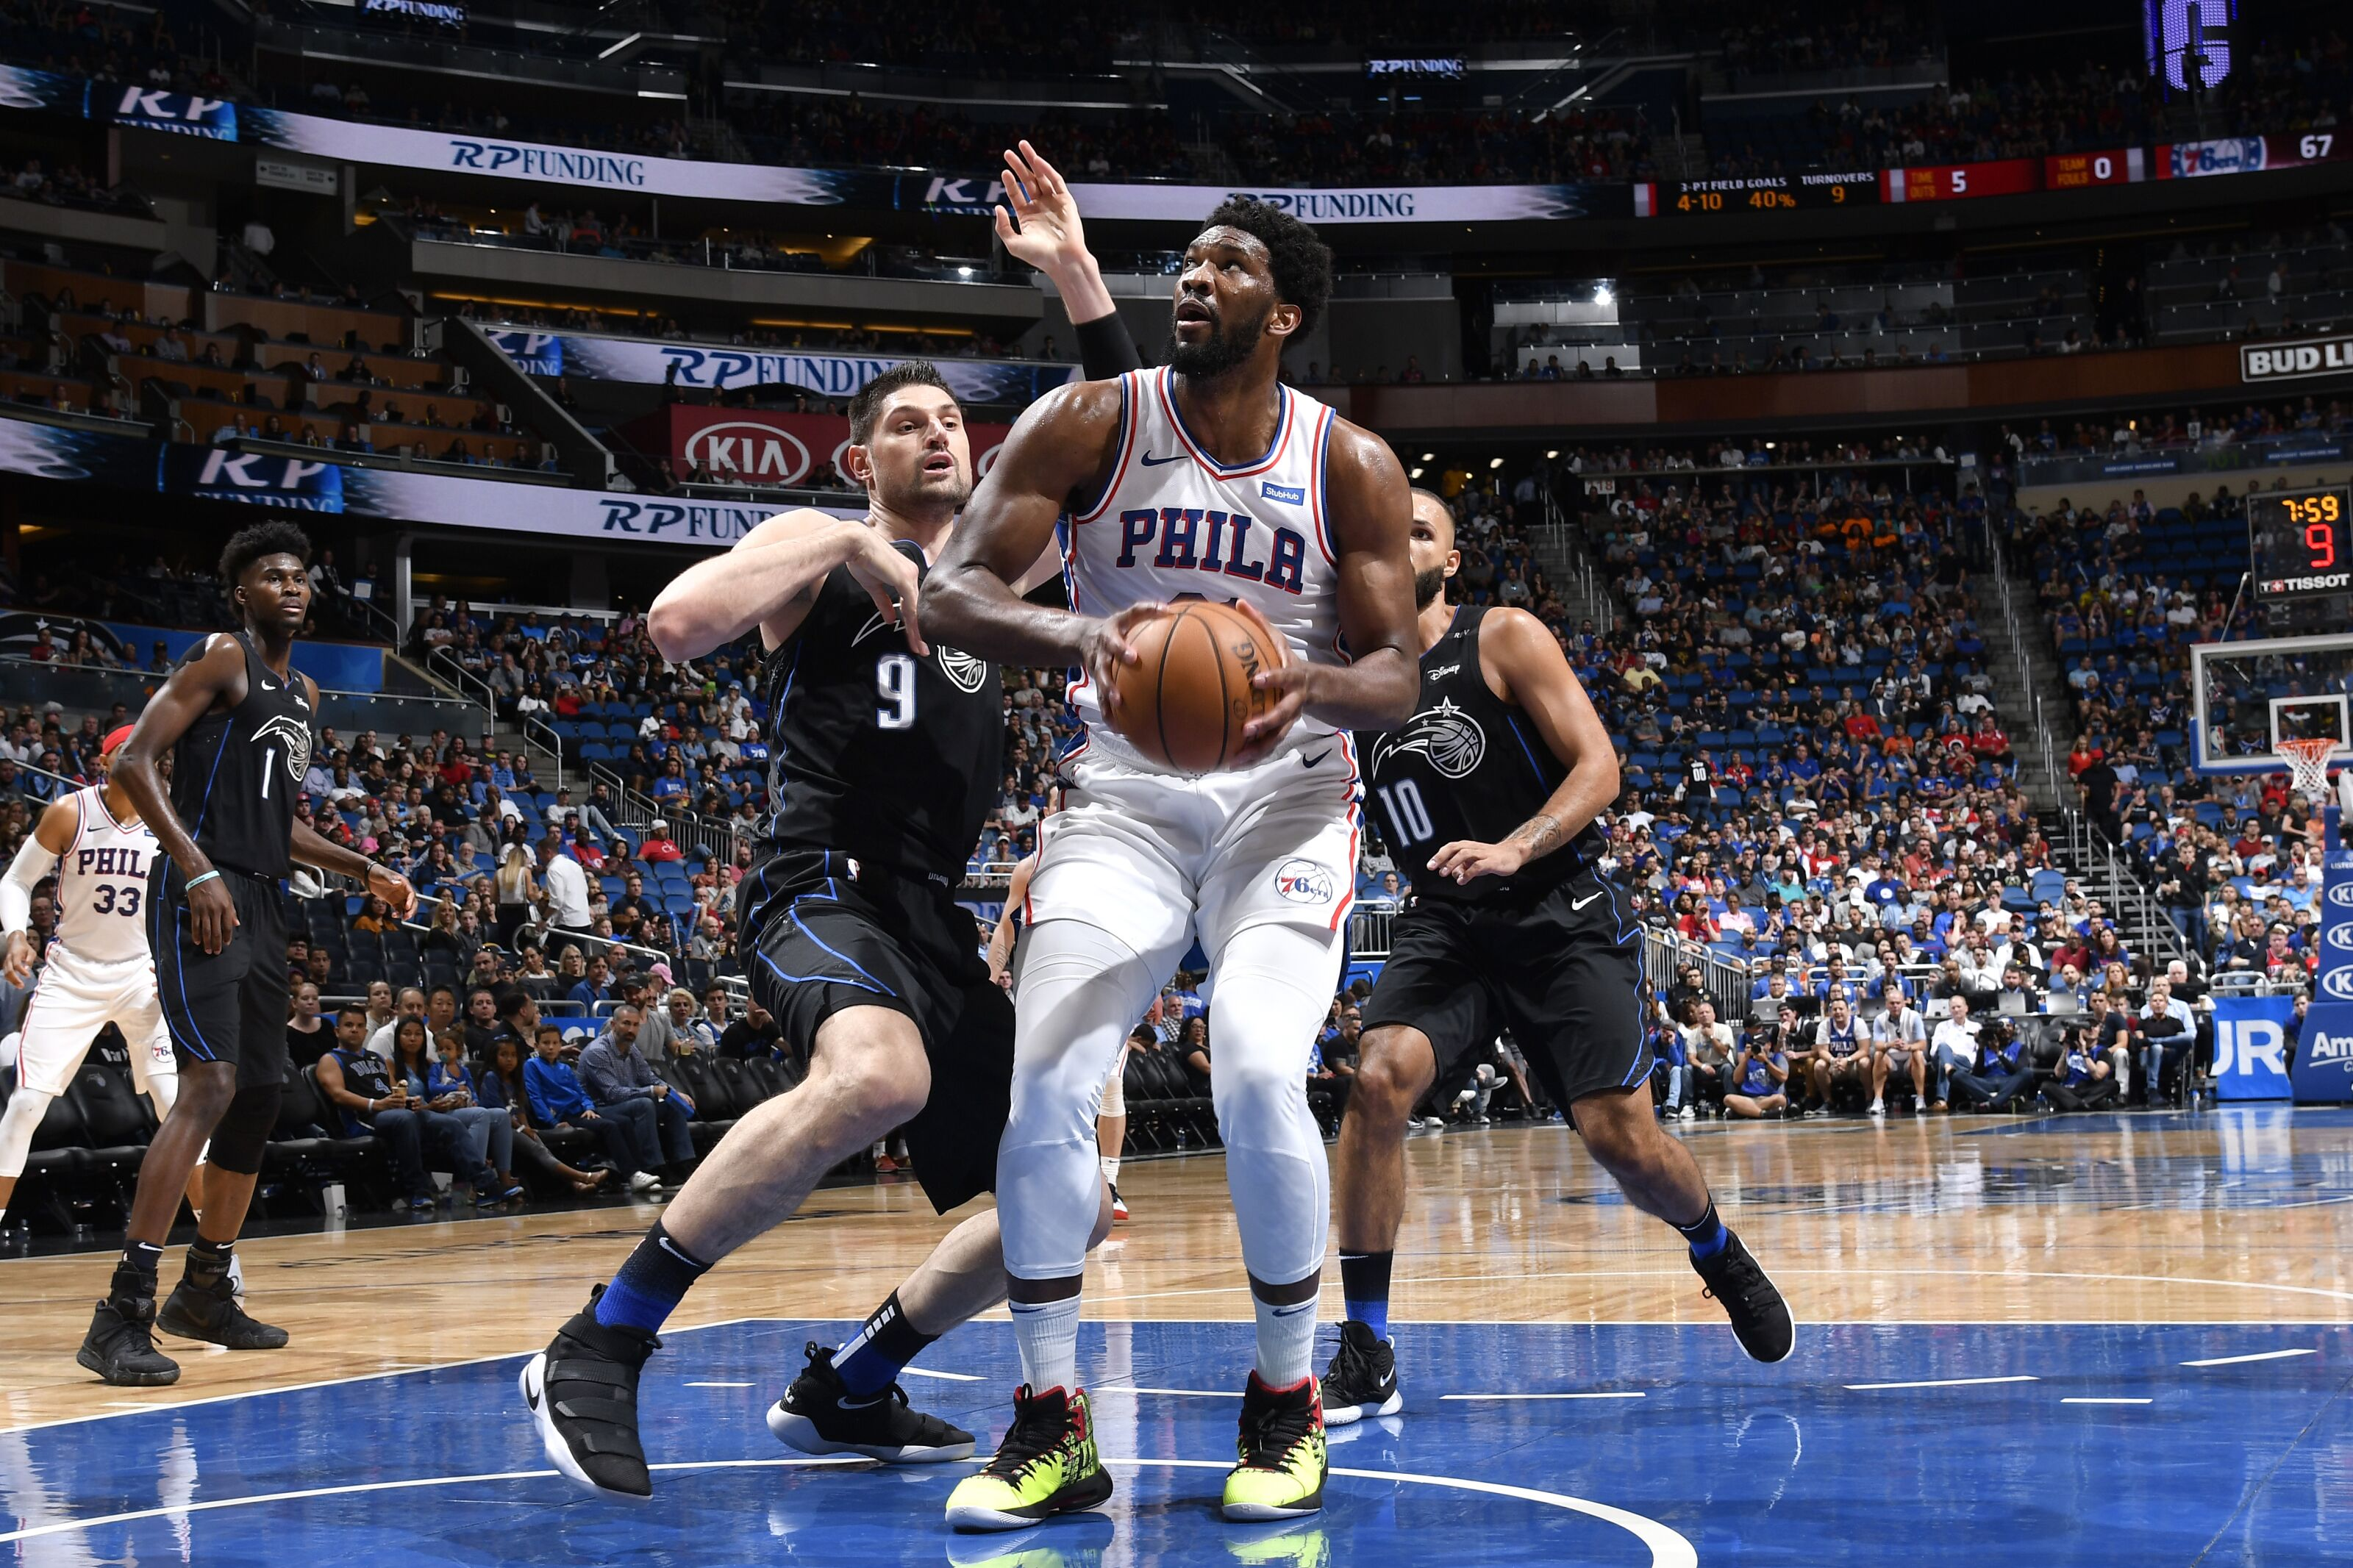 Philadelphia 76ers: Don't overreact to bad losses in Atlanta, Orlando